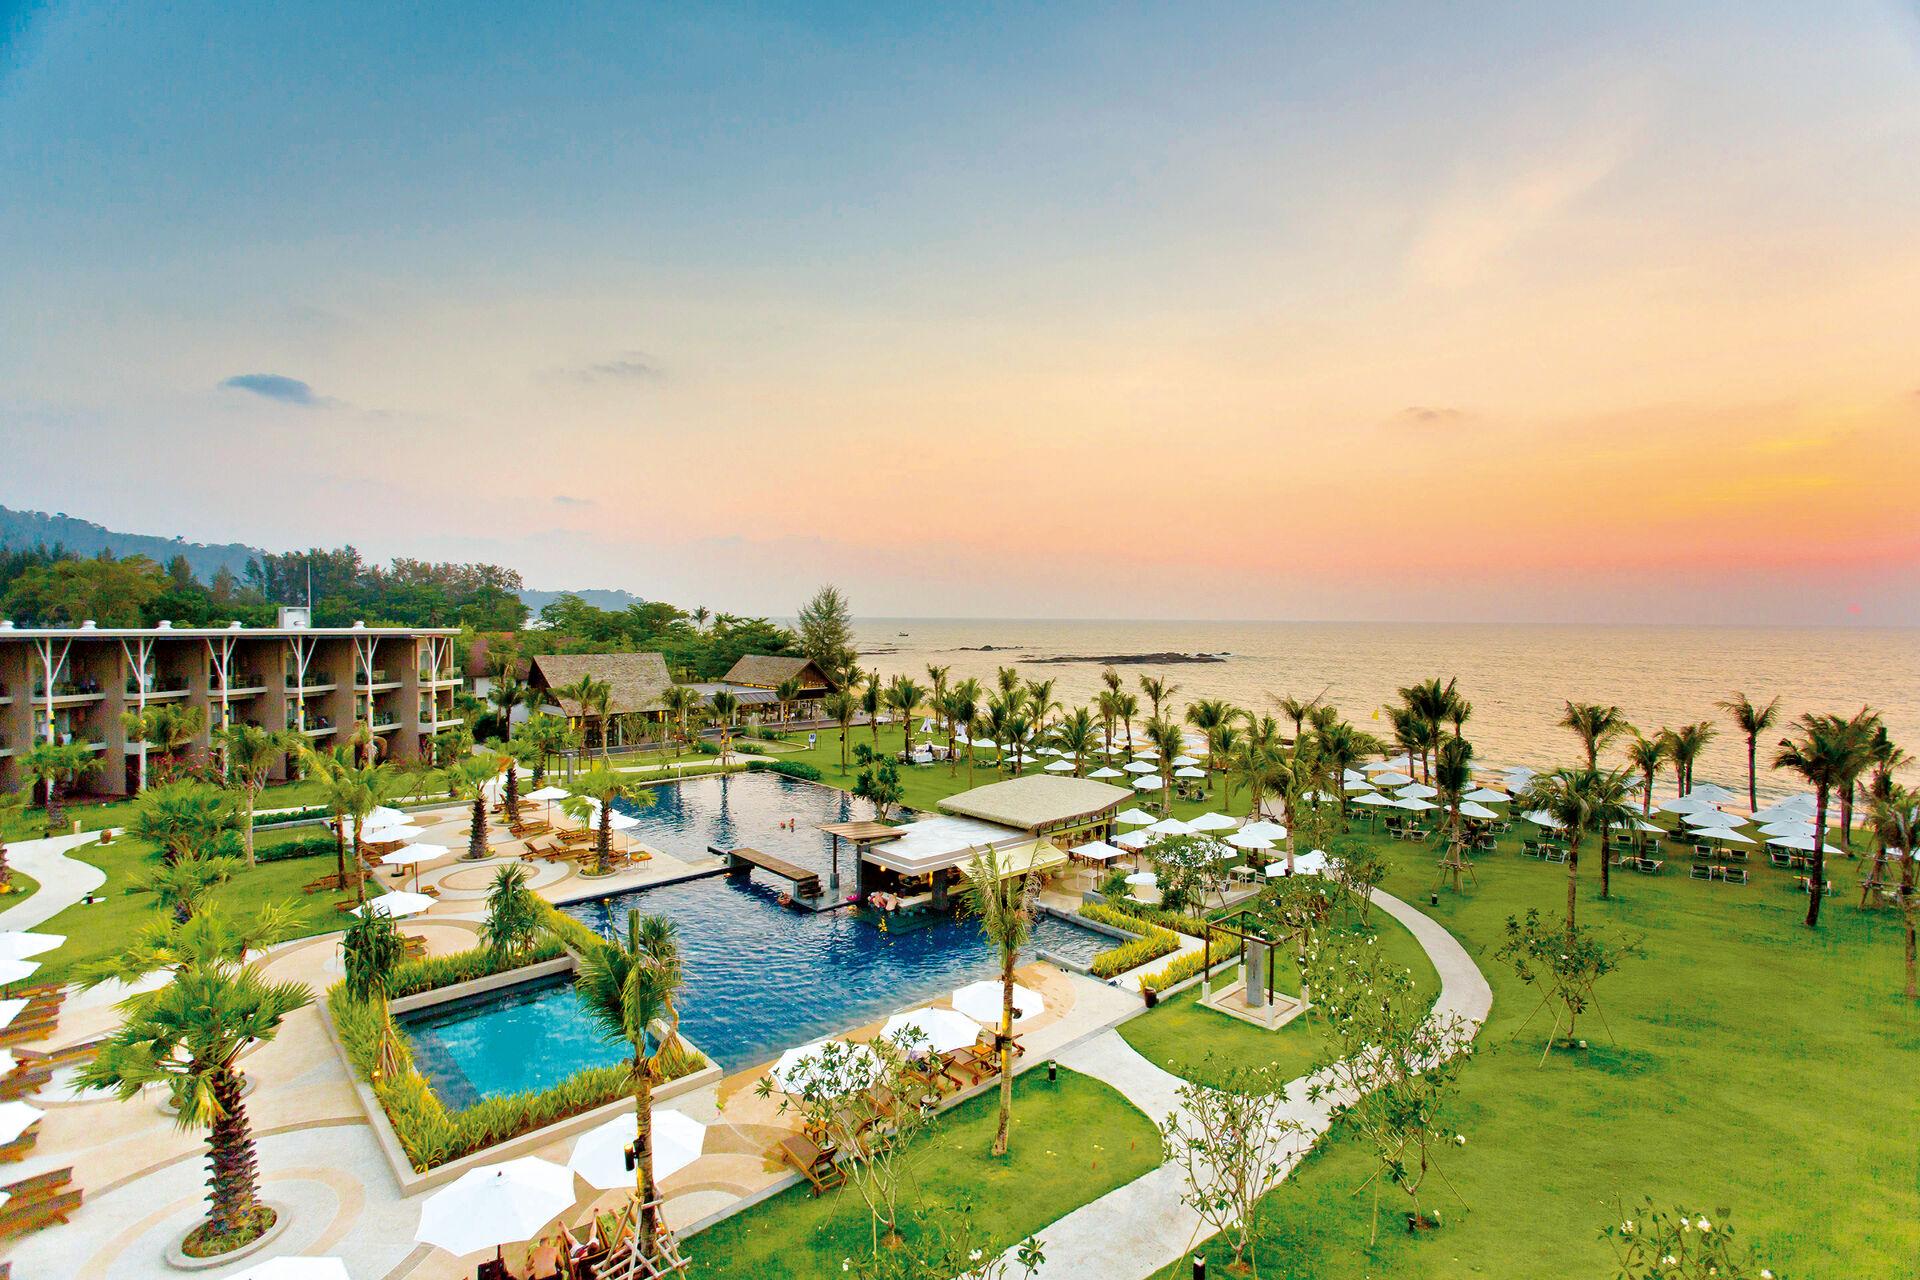 The Sands Khao Lak Beach Resort by Katathani - 4*